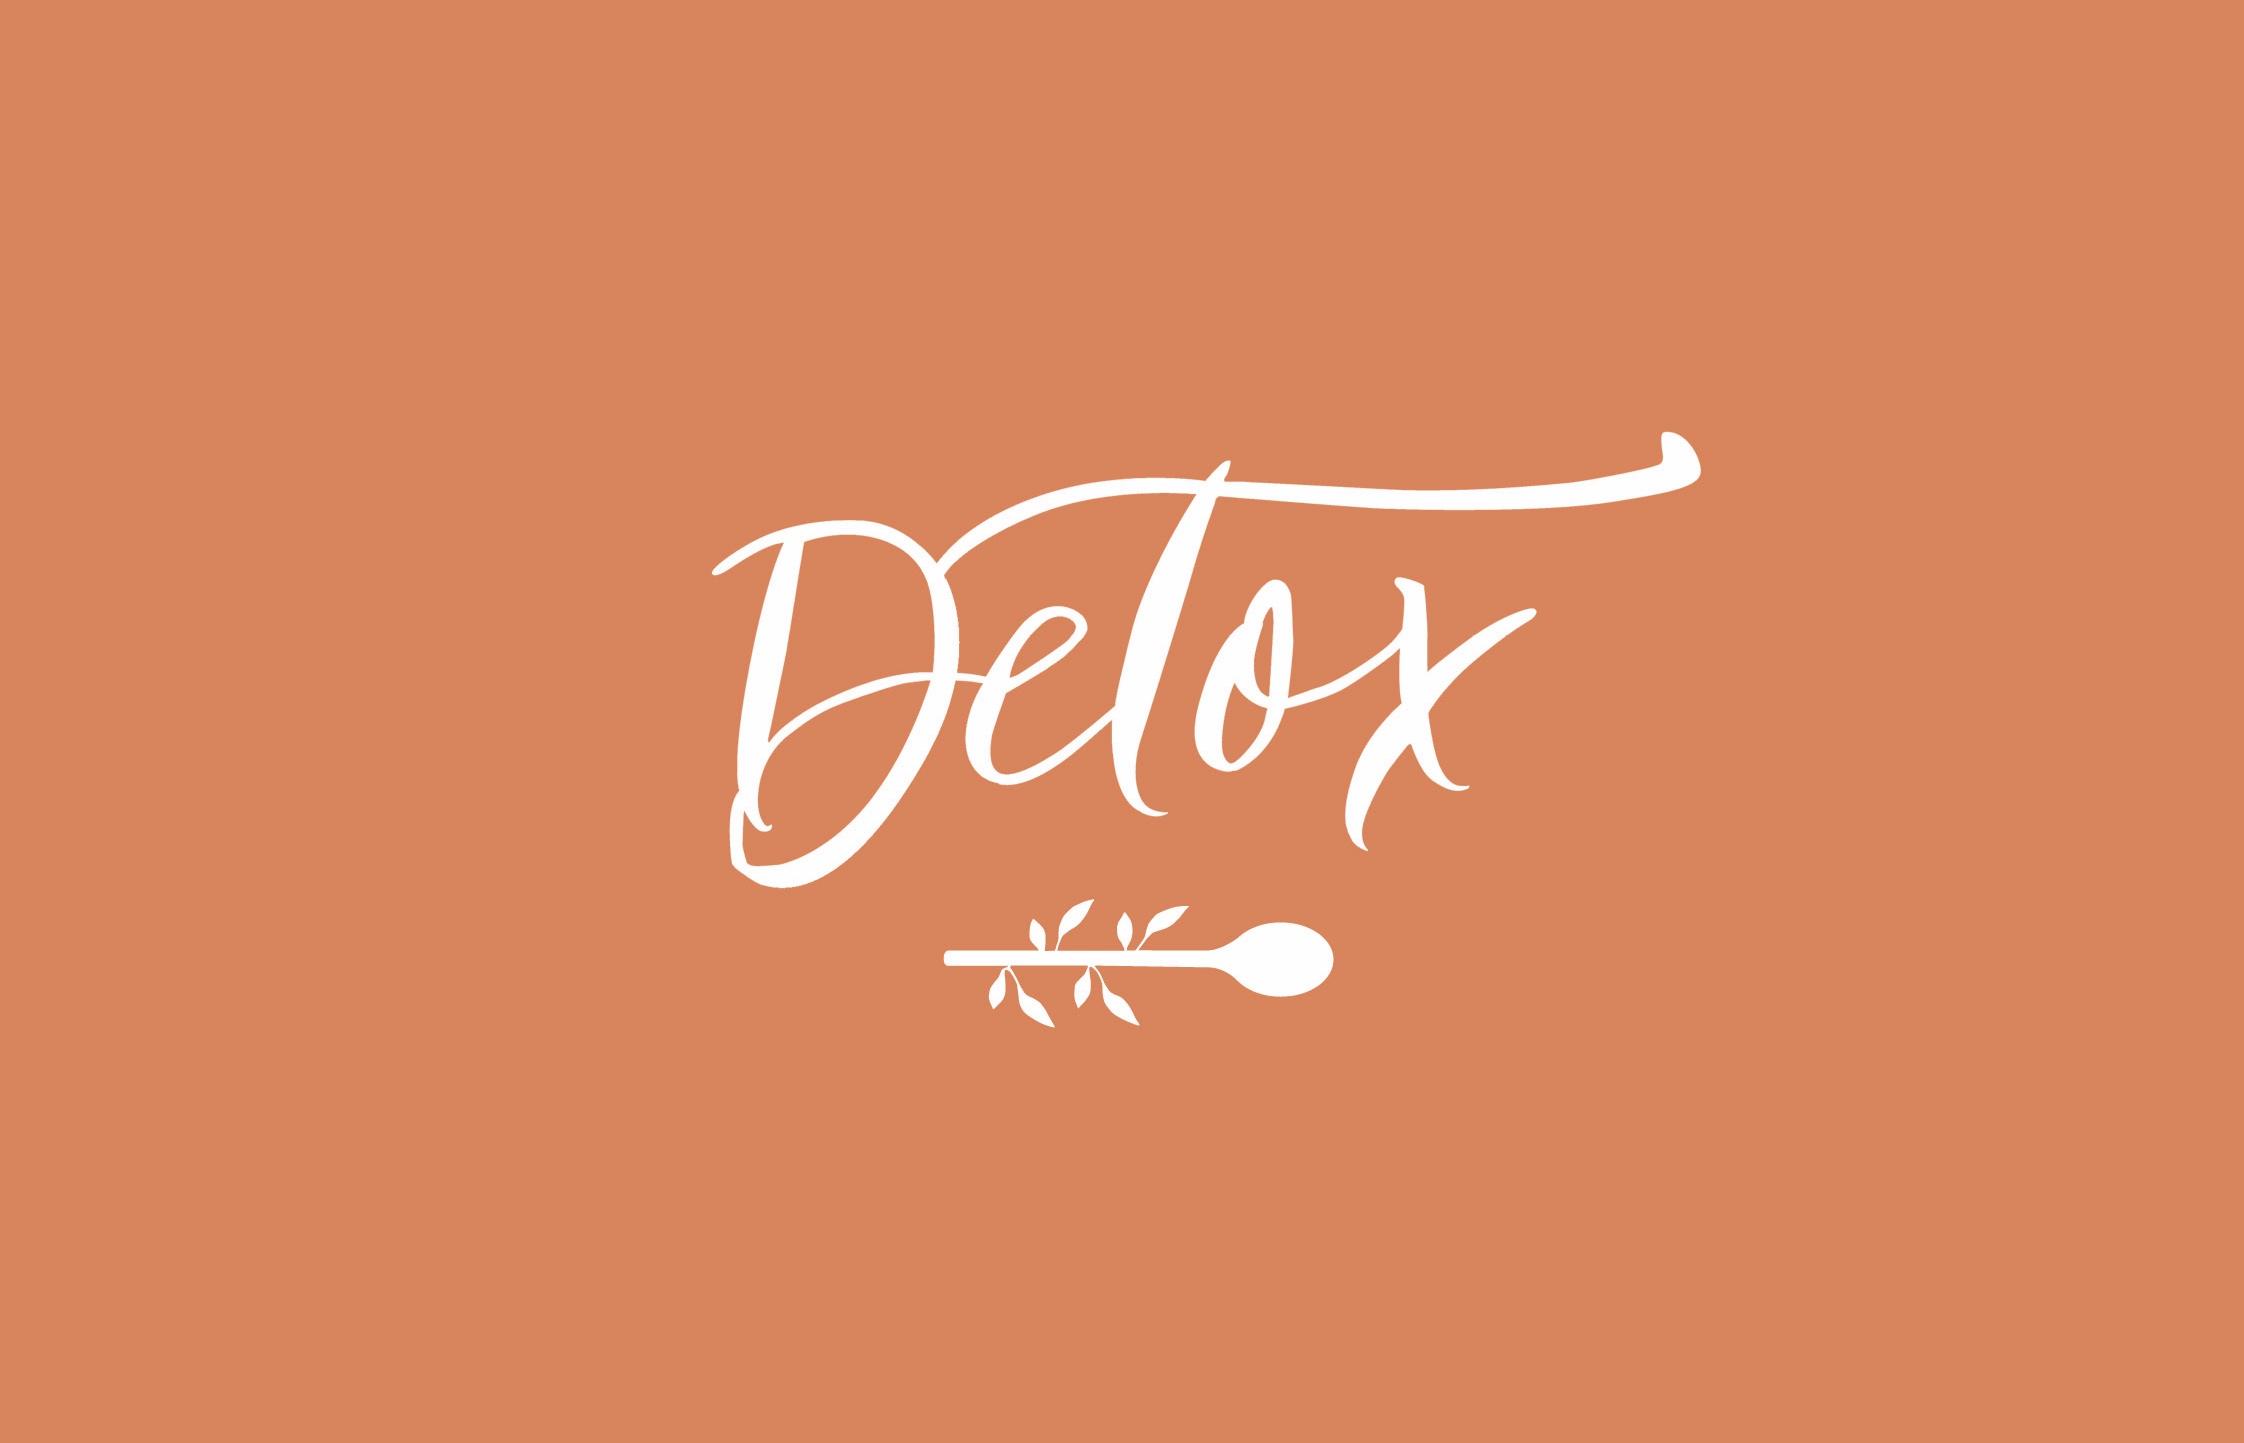 DETOX+.jpg